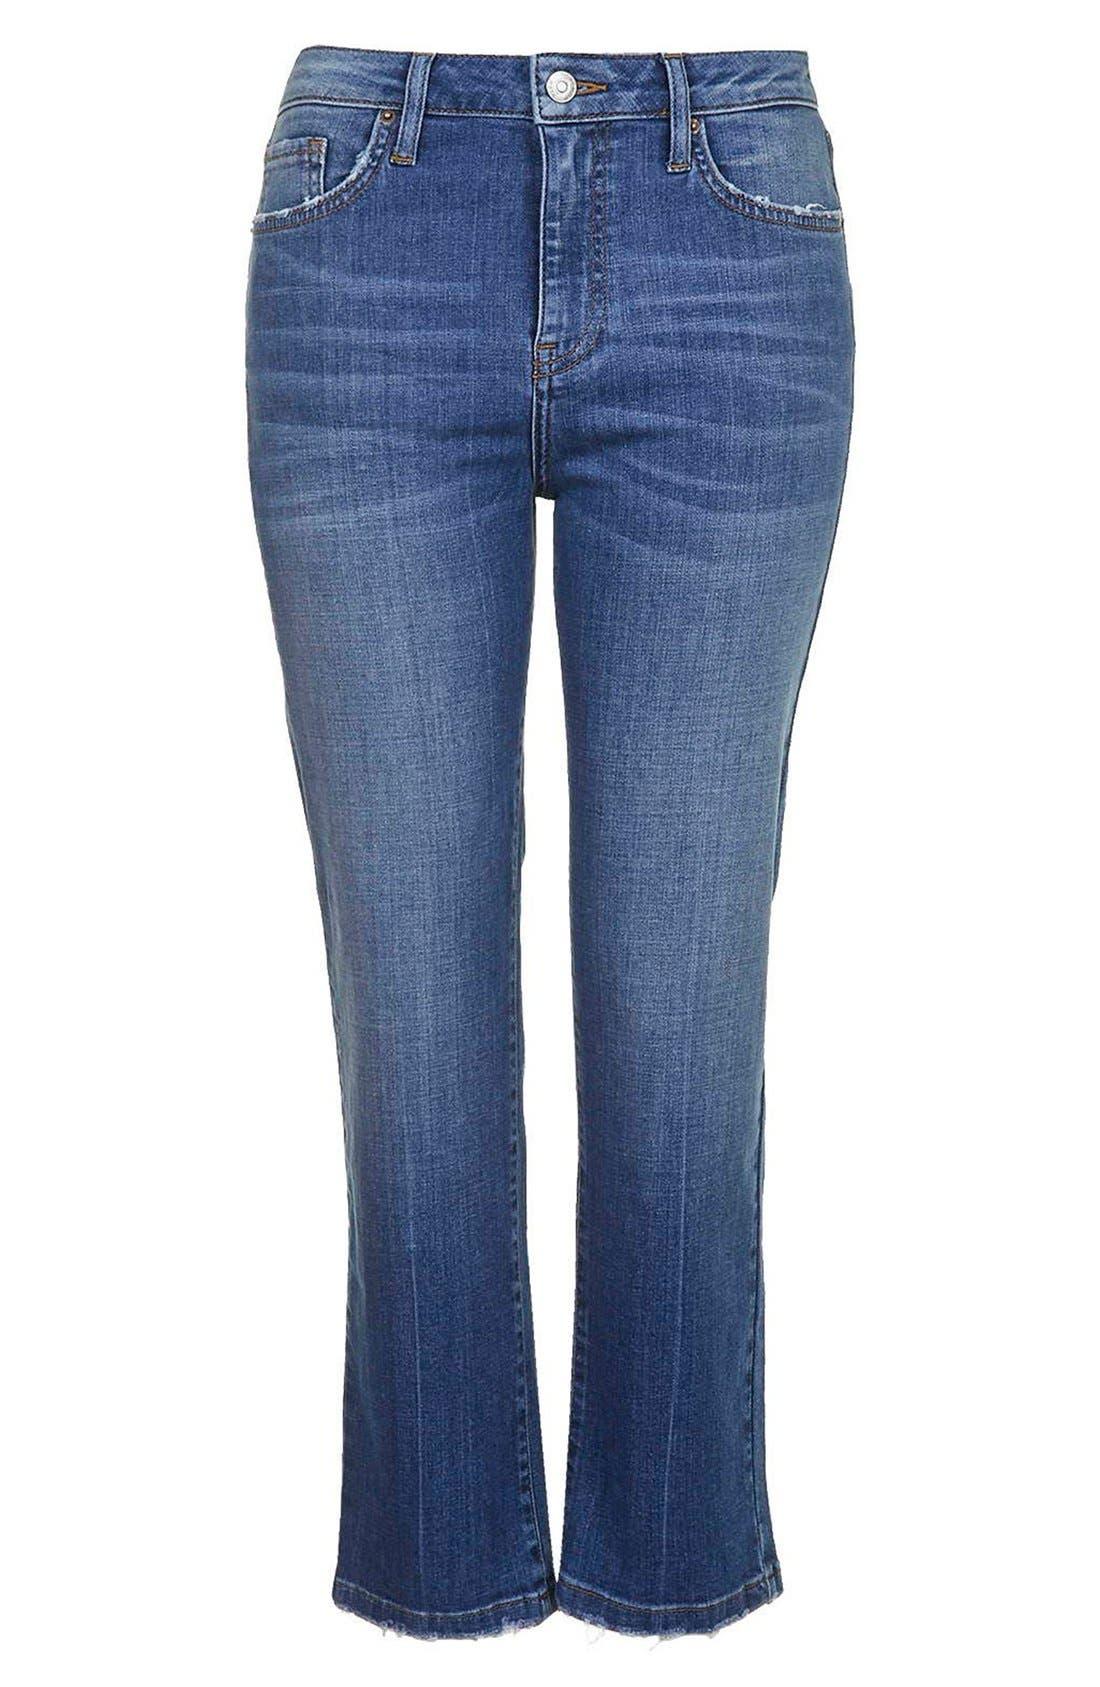 Alternate Image 2  - TopshopFlared Crop Jeans (Mid Denim) (Petite)